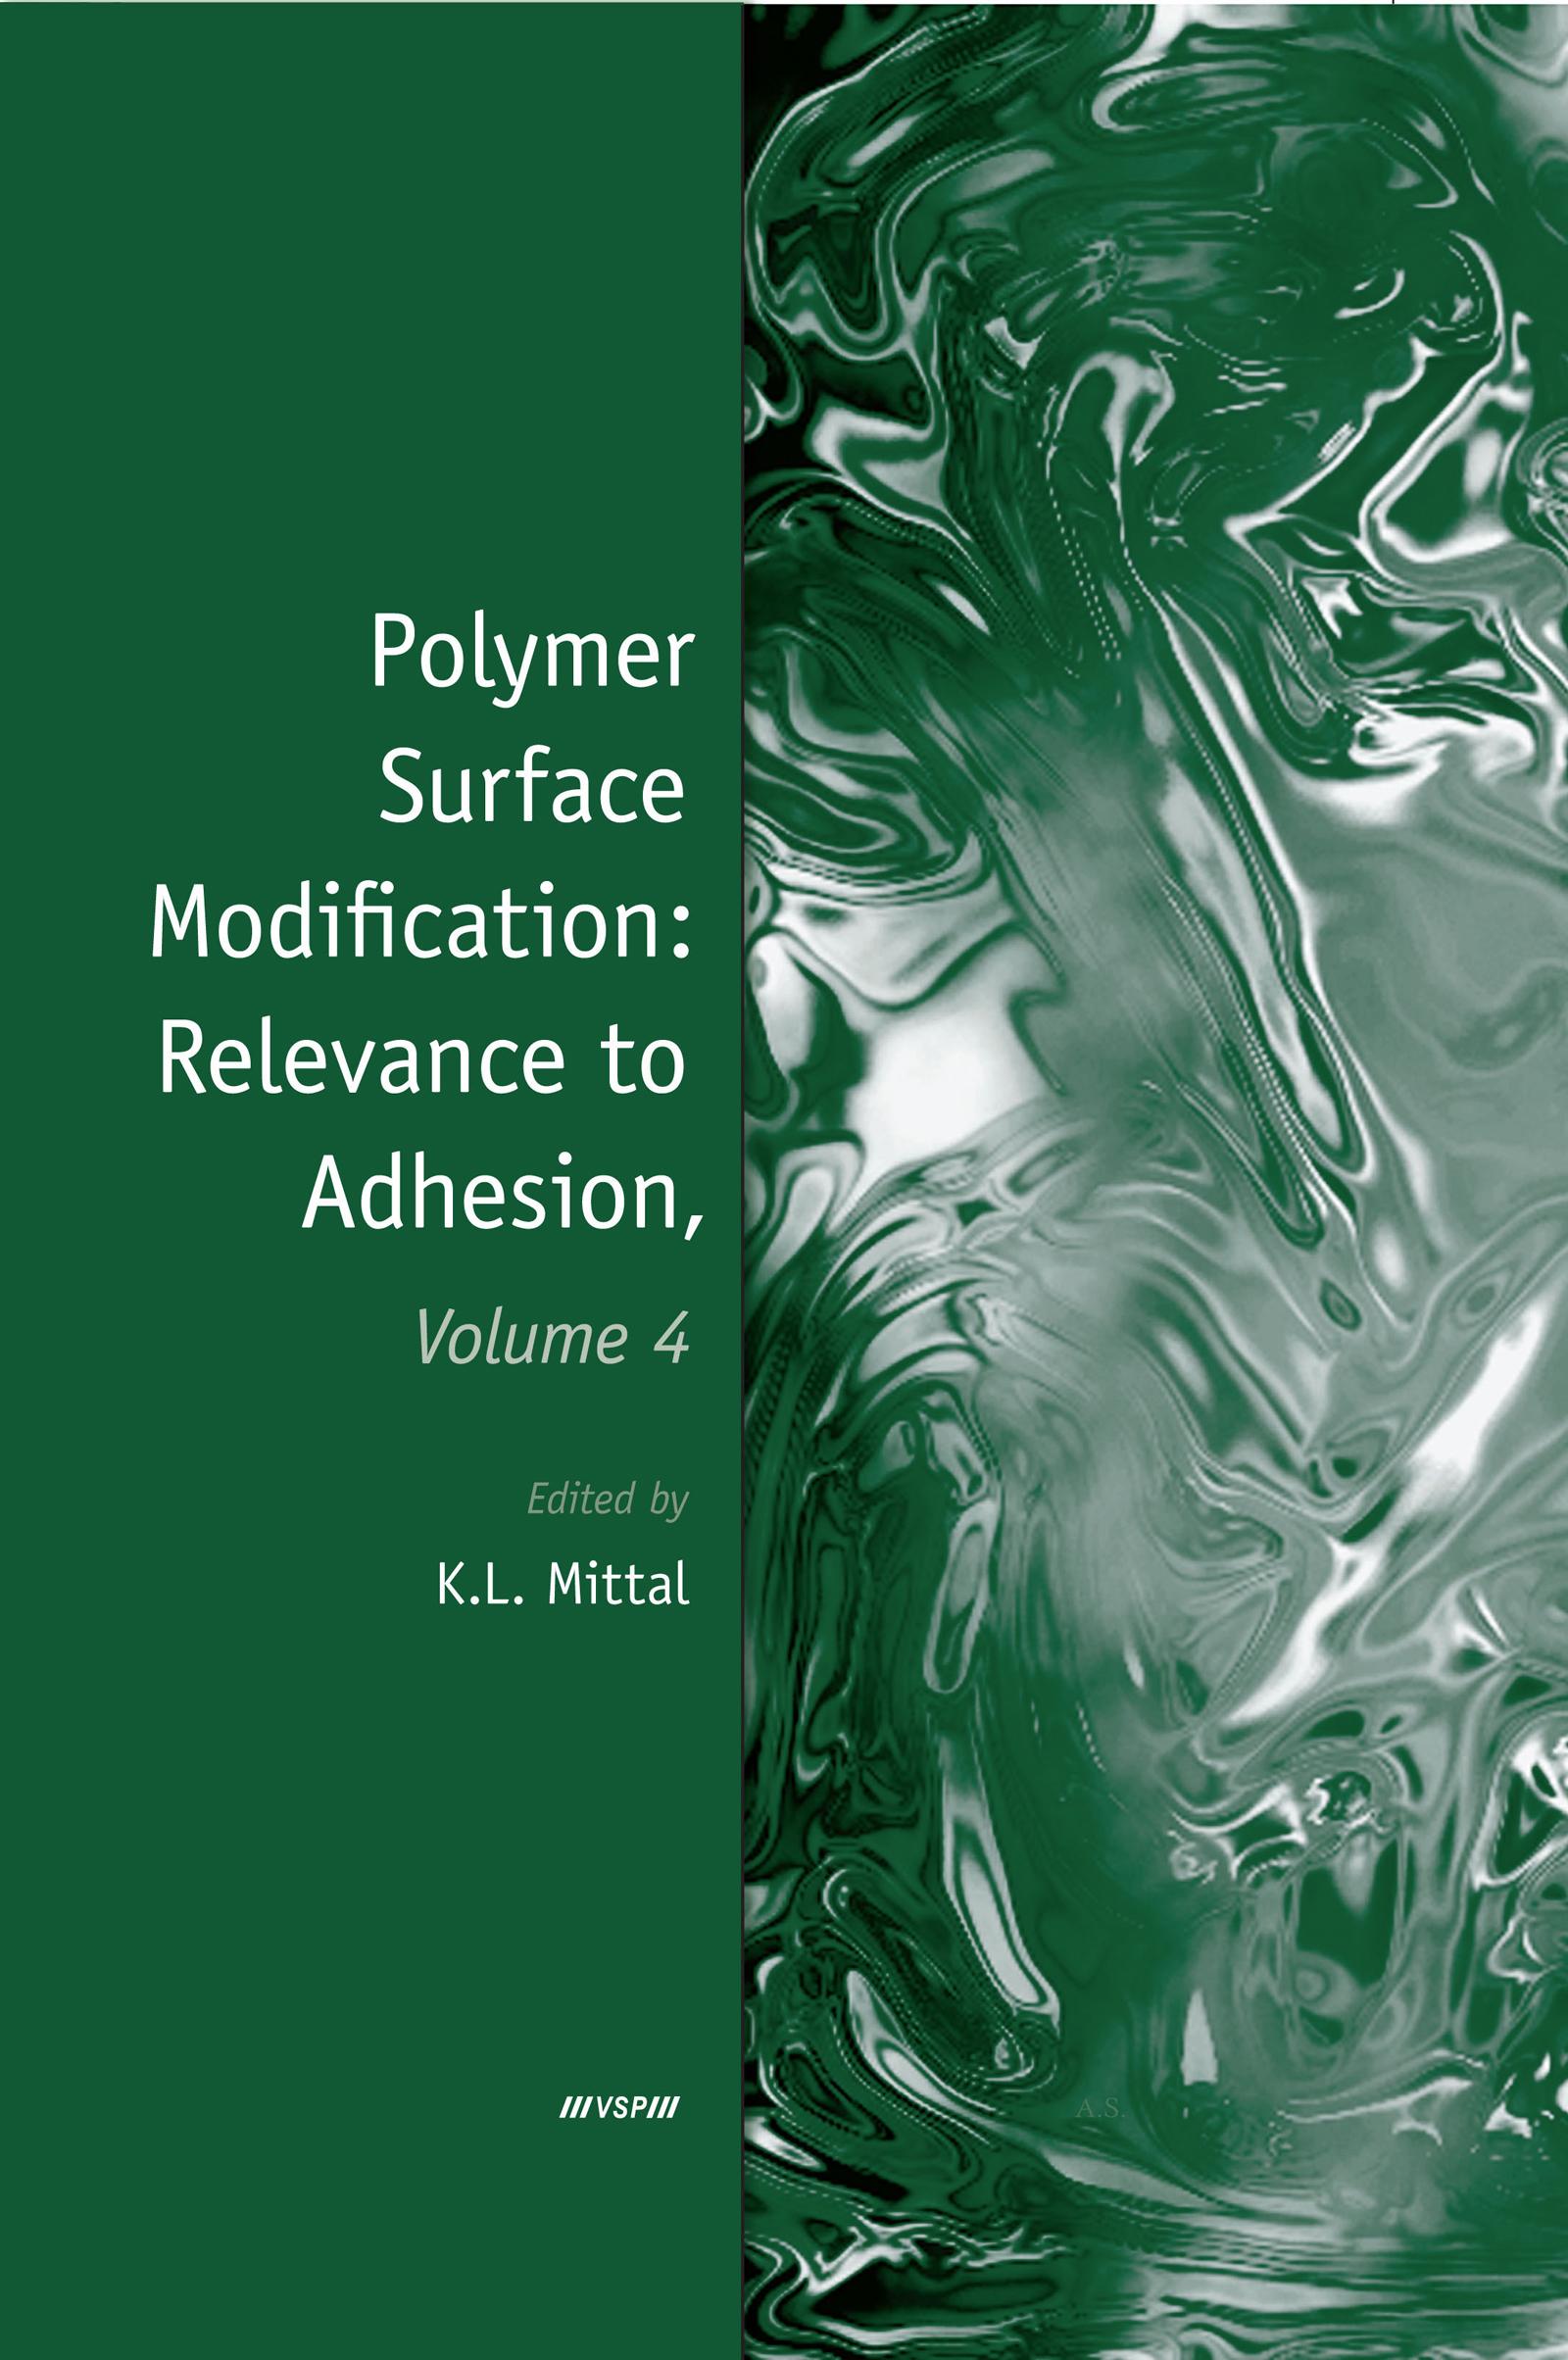 Improvement of adhesion between poly(tetrafluoroethylene) and poly(ethylene terephthalate) films